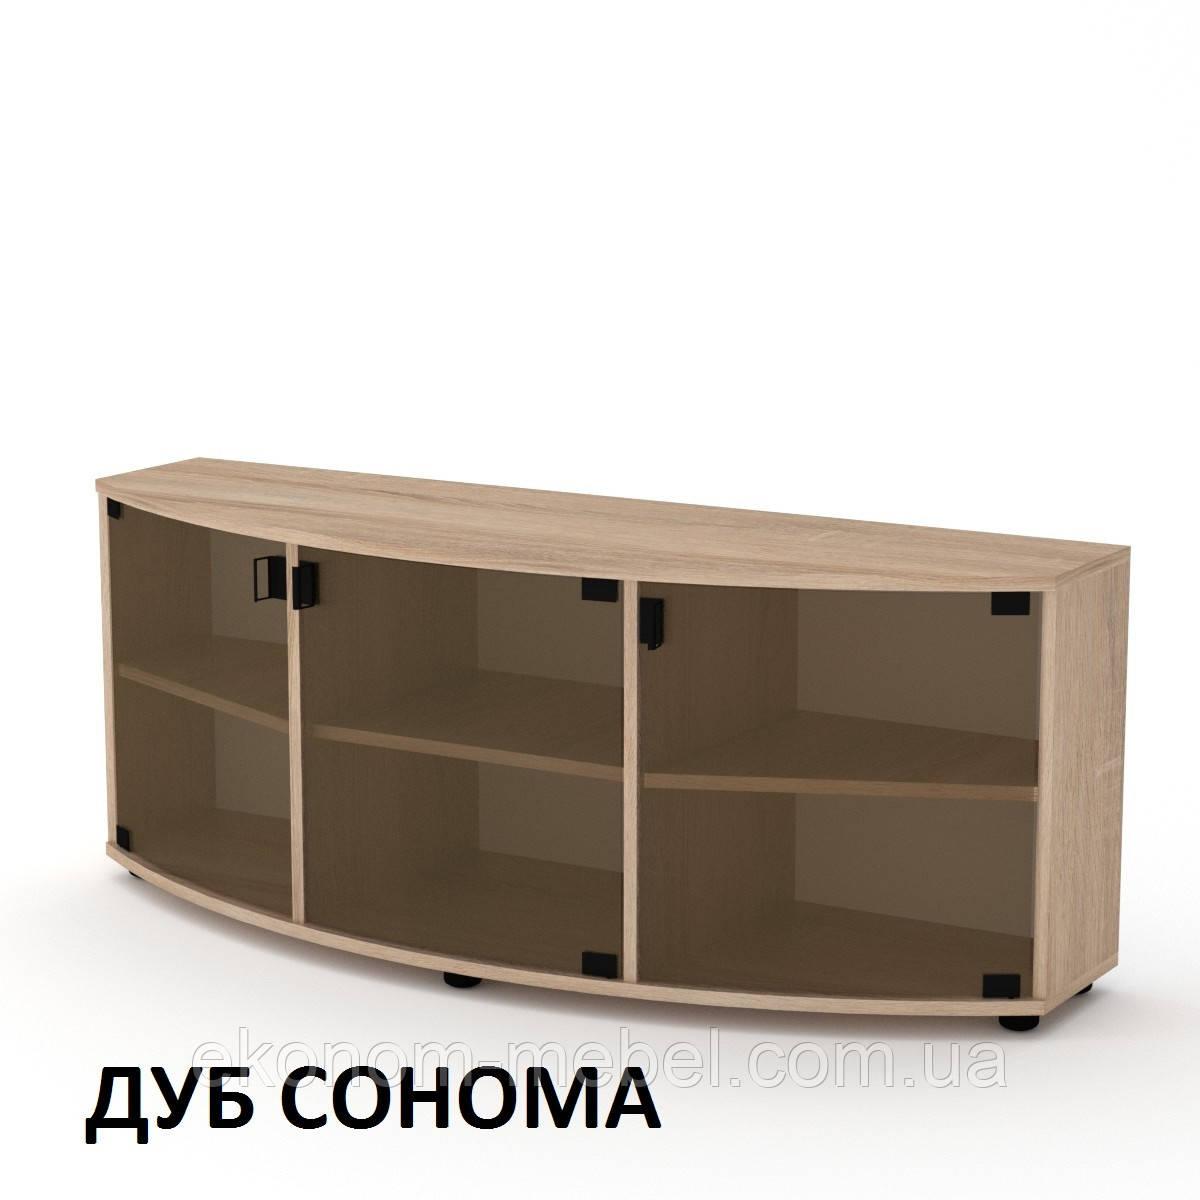 Тумба под телевизор стеклянная Плазма-2 под плазменный телевизор